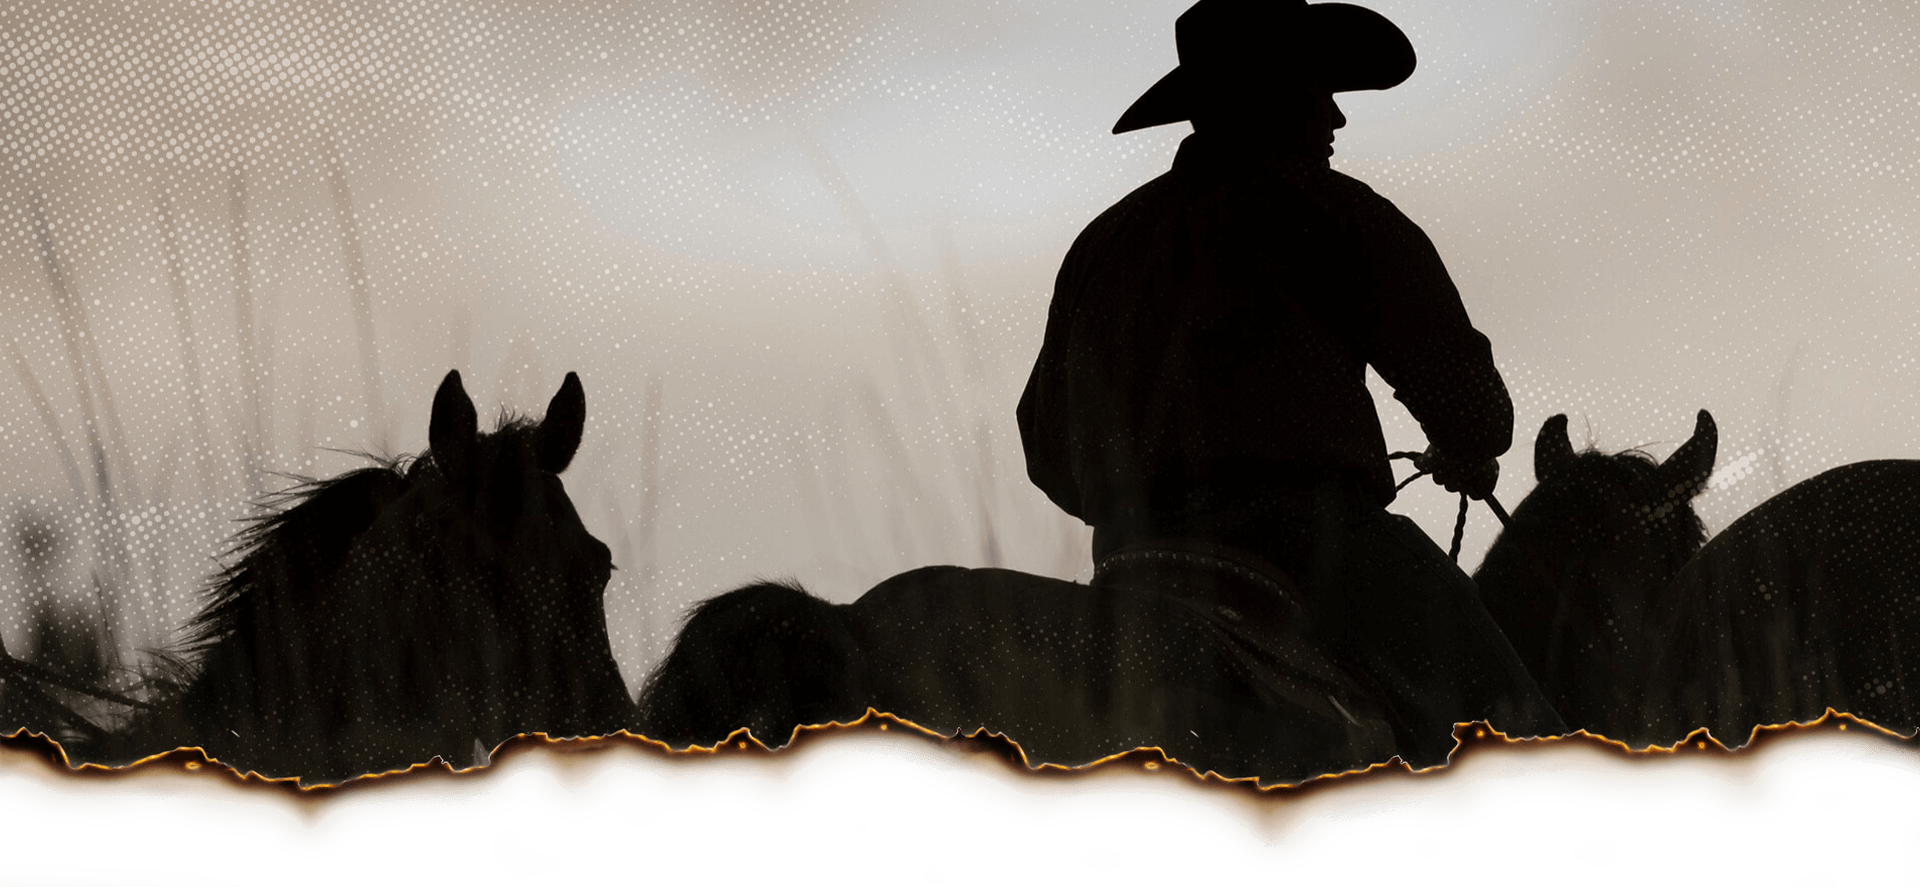 Bylaws Header Image Cowboy With Horses